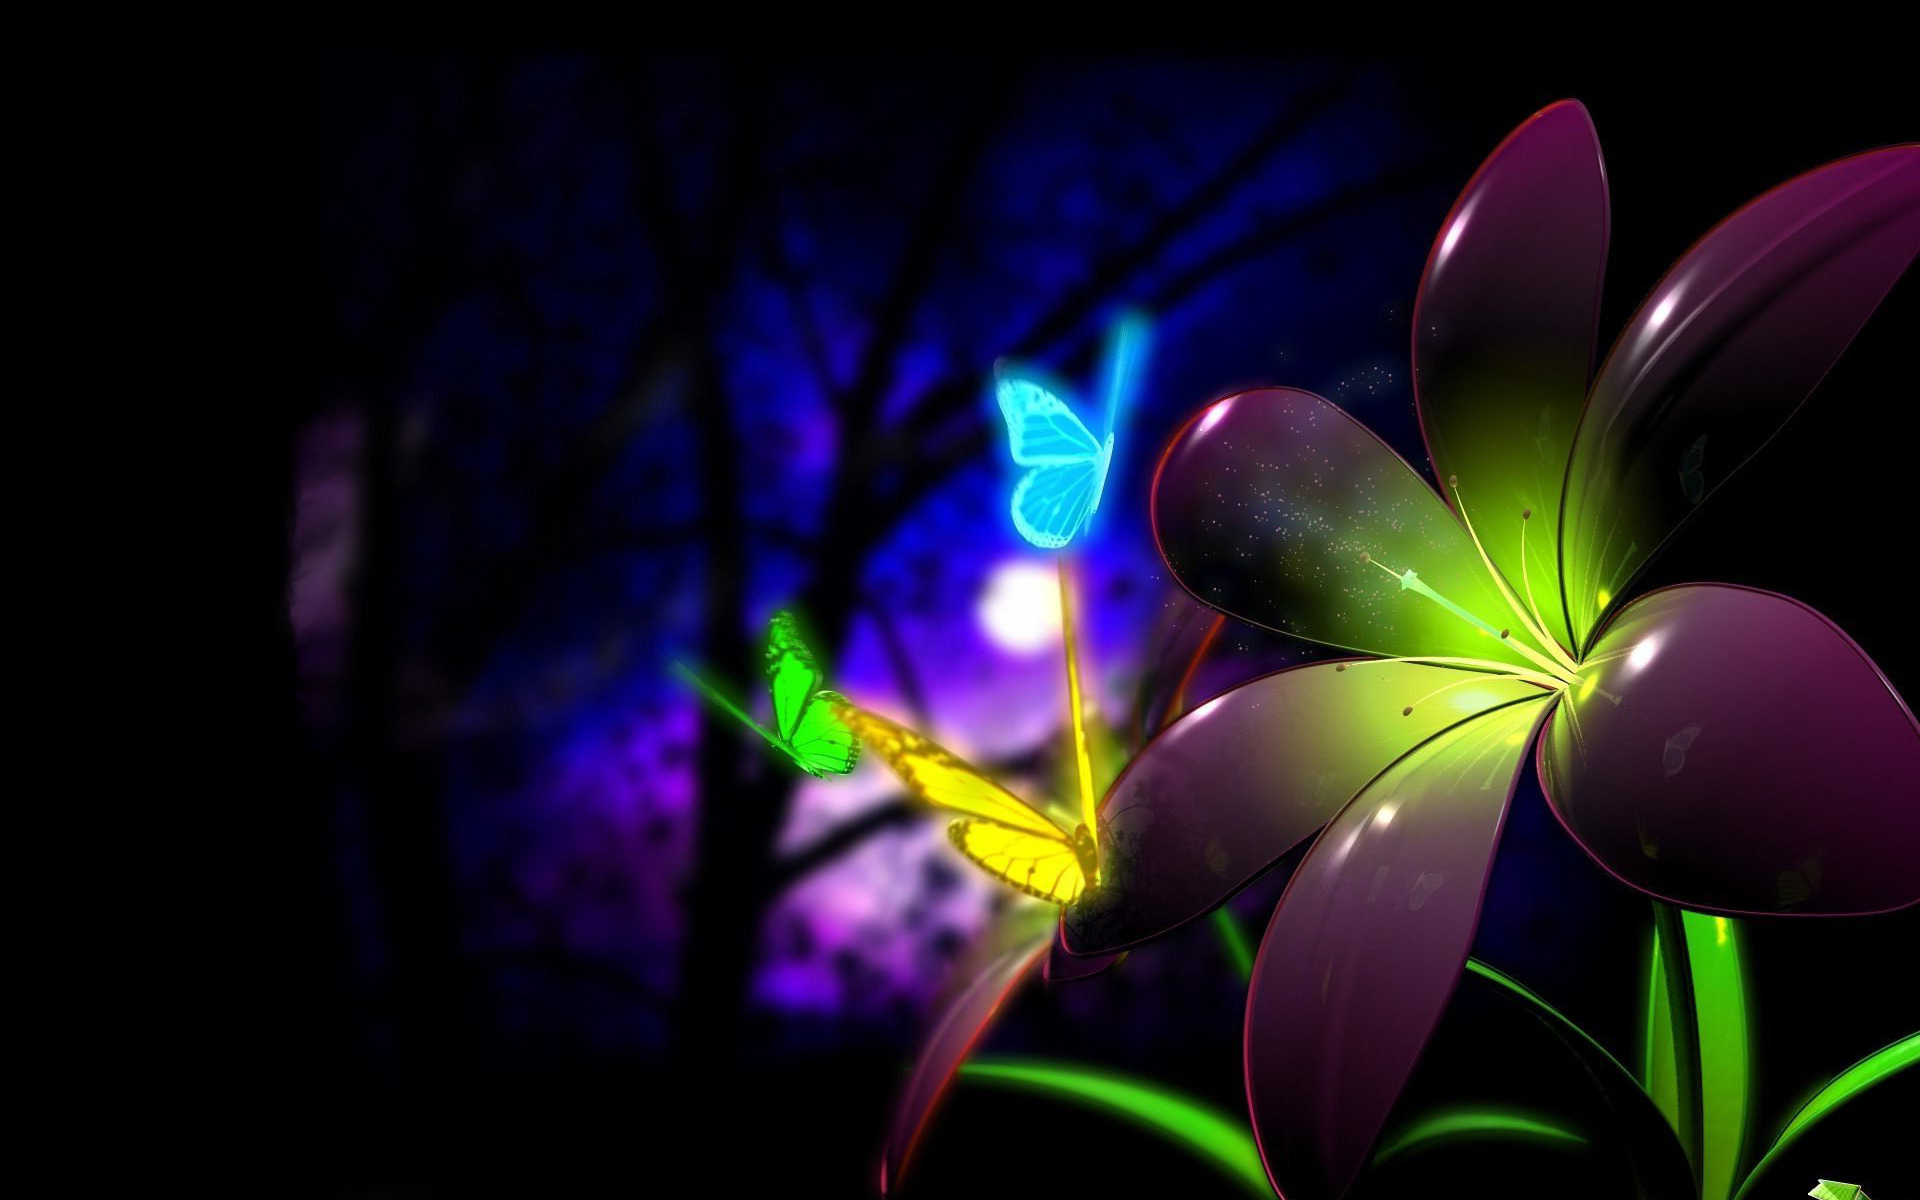 Fondos De Pantalla Con Movimiento 3d Hd: Neon Butterflies Full HD Wallpaper And Background Image